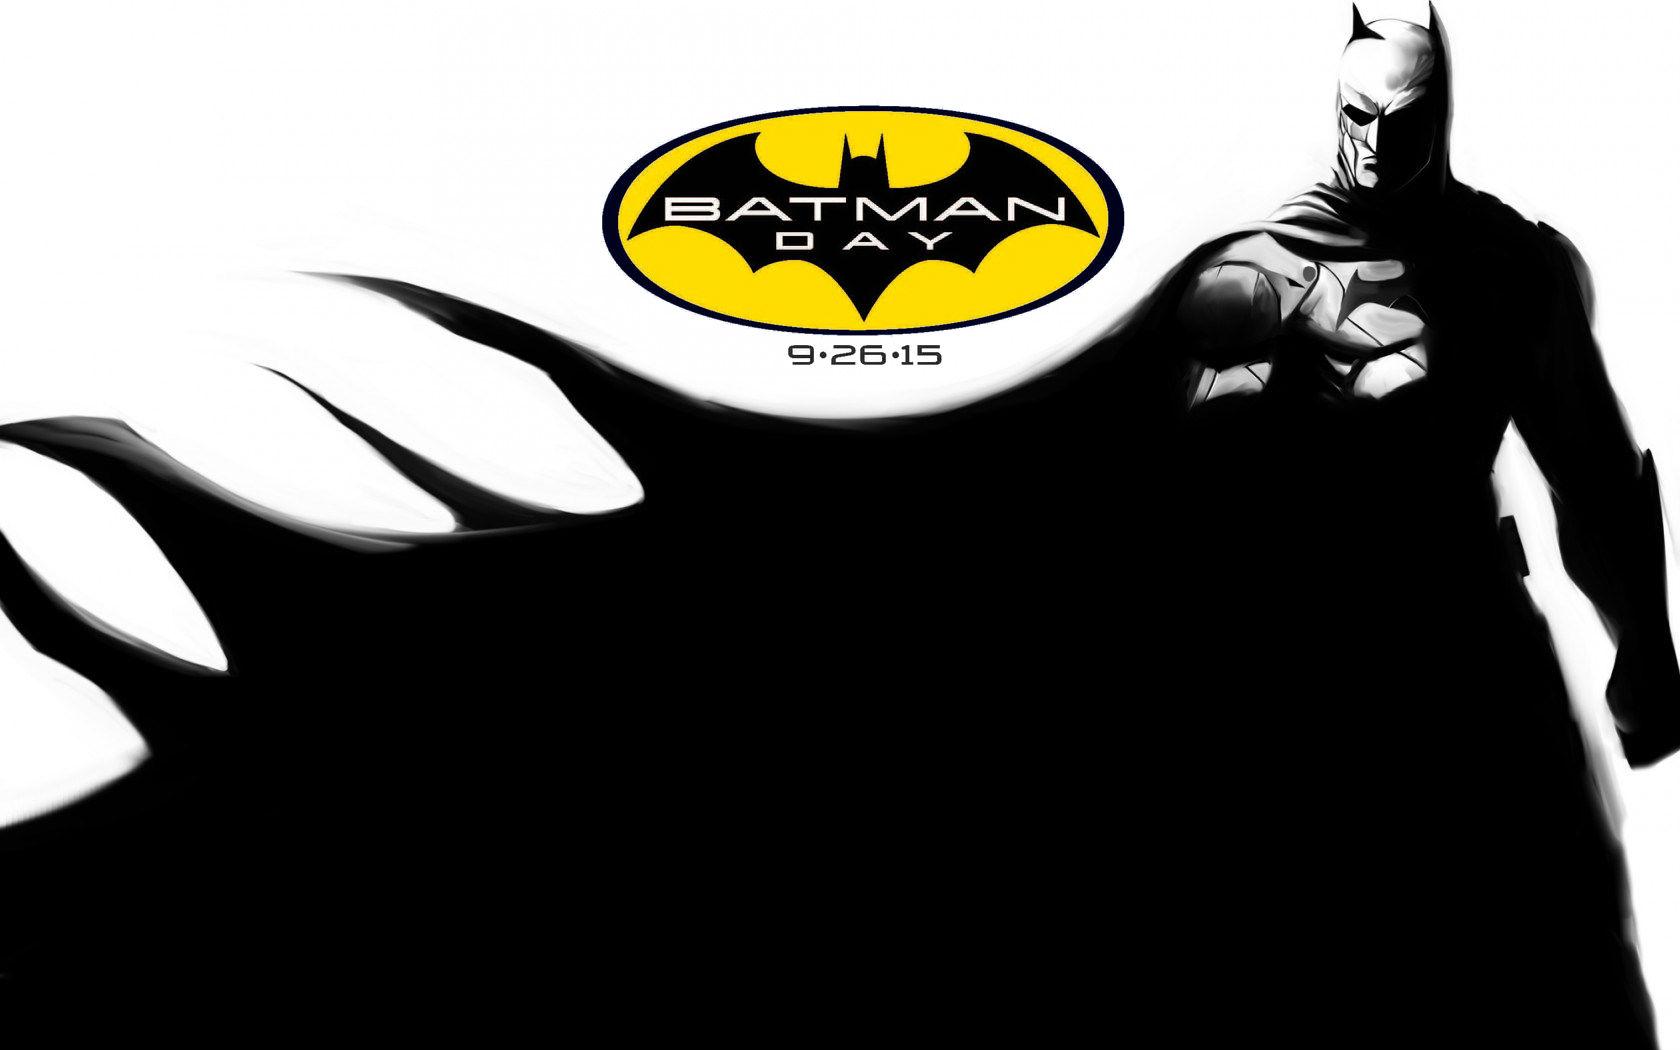 batman-mask-hd-wallpaper1batmanday.jpg